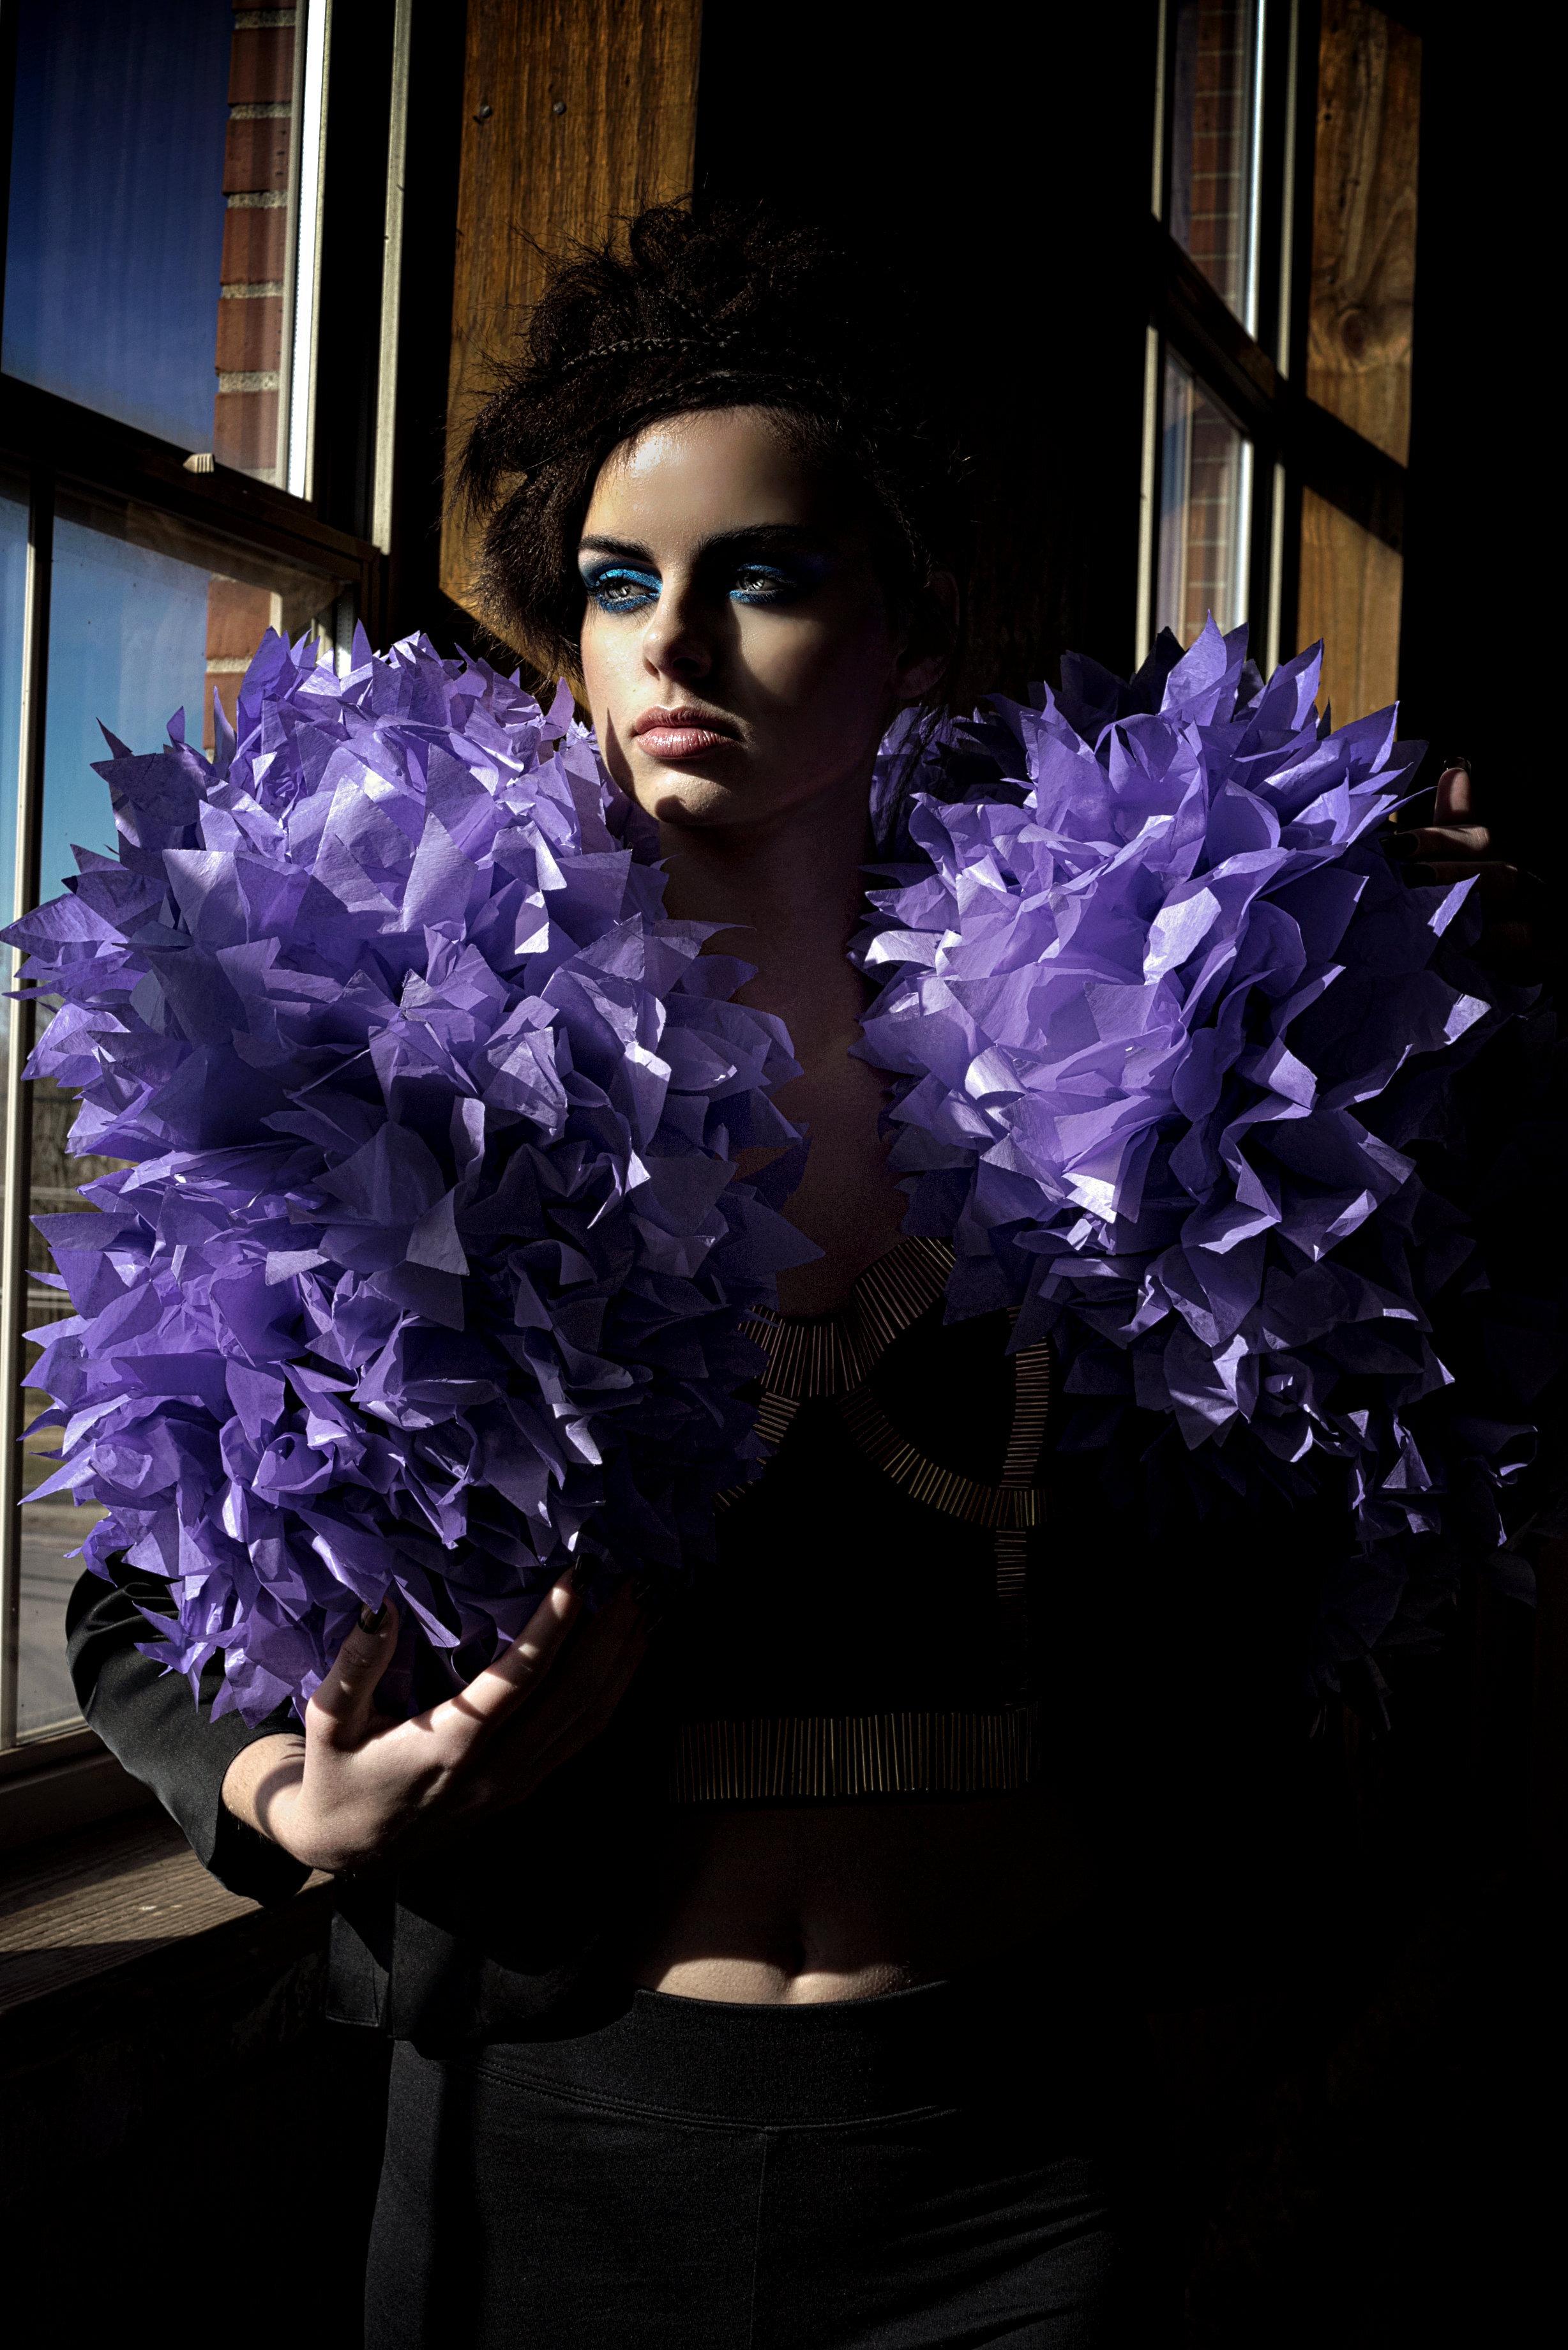 image by Genna Yussman Greene / Absolute Studio